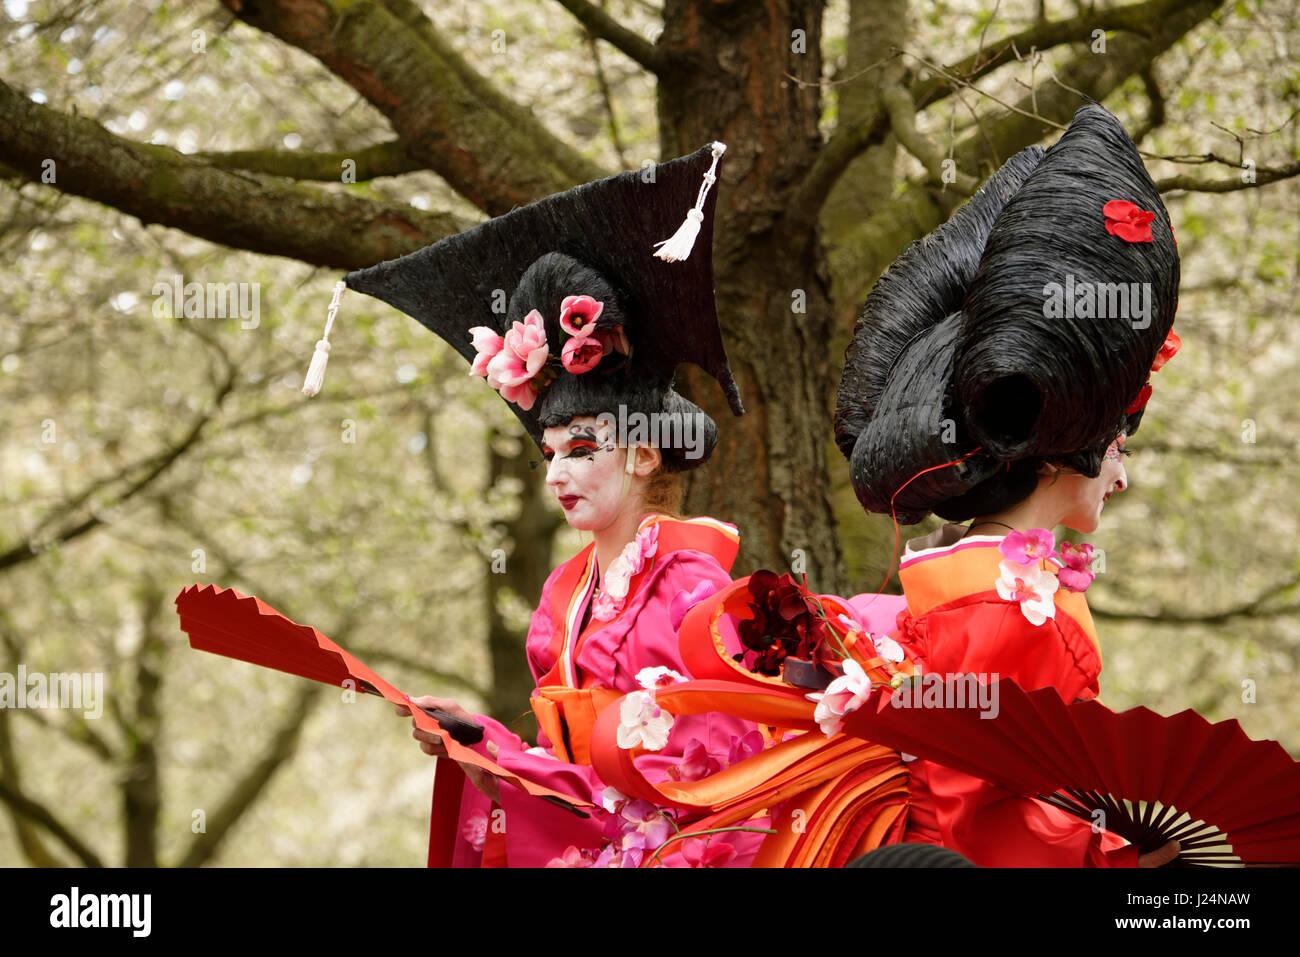 Hiroshima-das Kirschblütenfesti in Hannover. - Stock Image